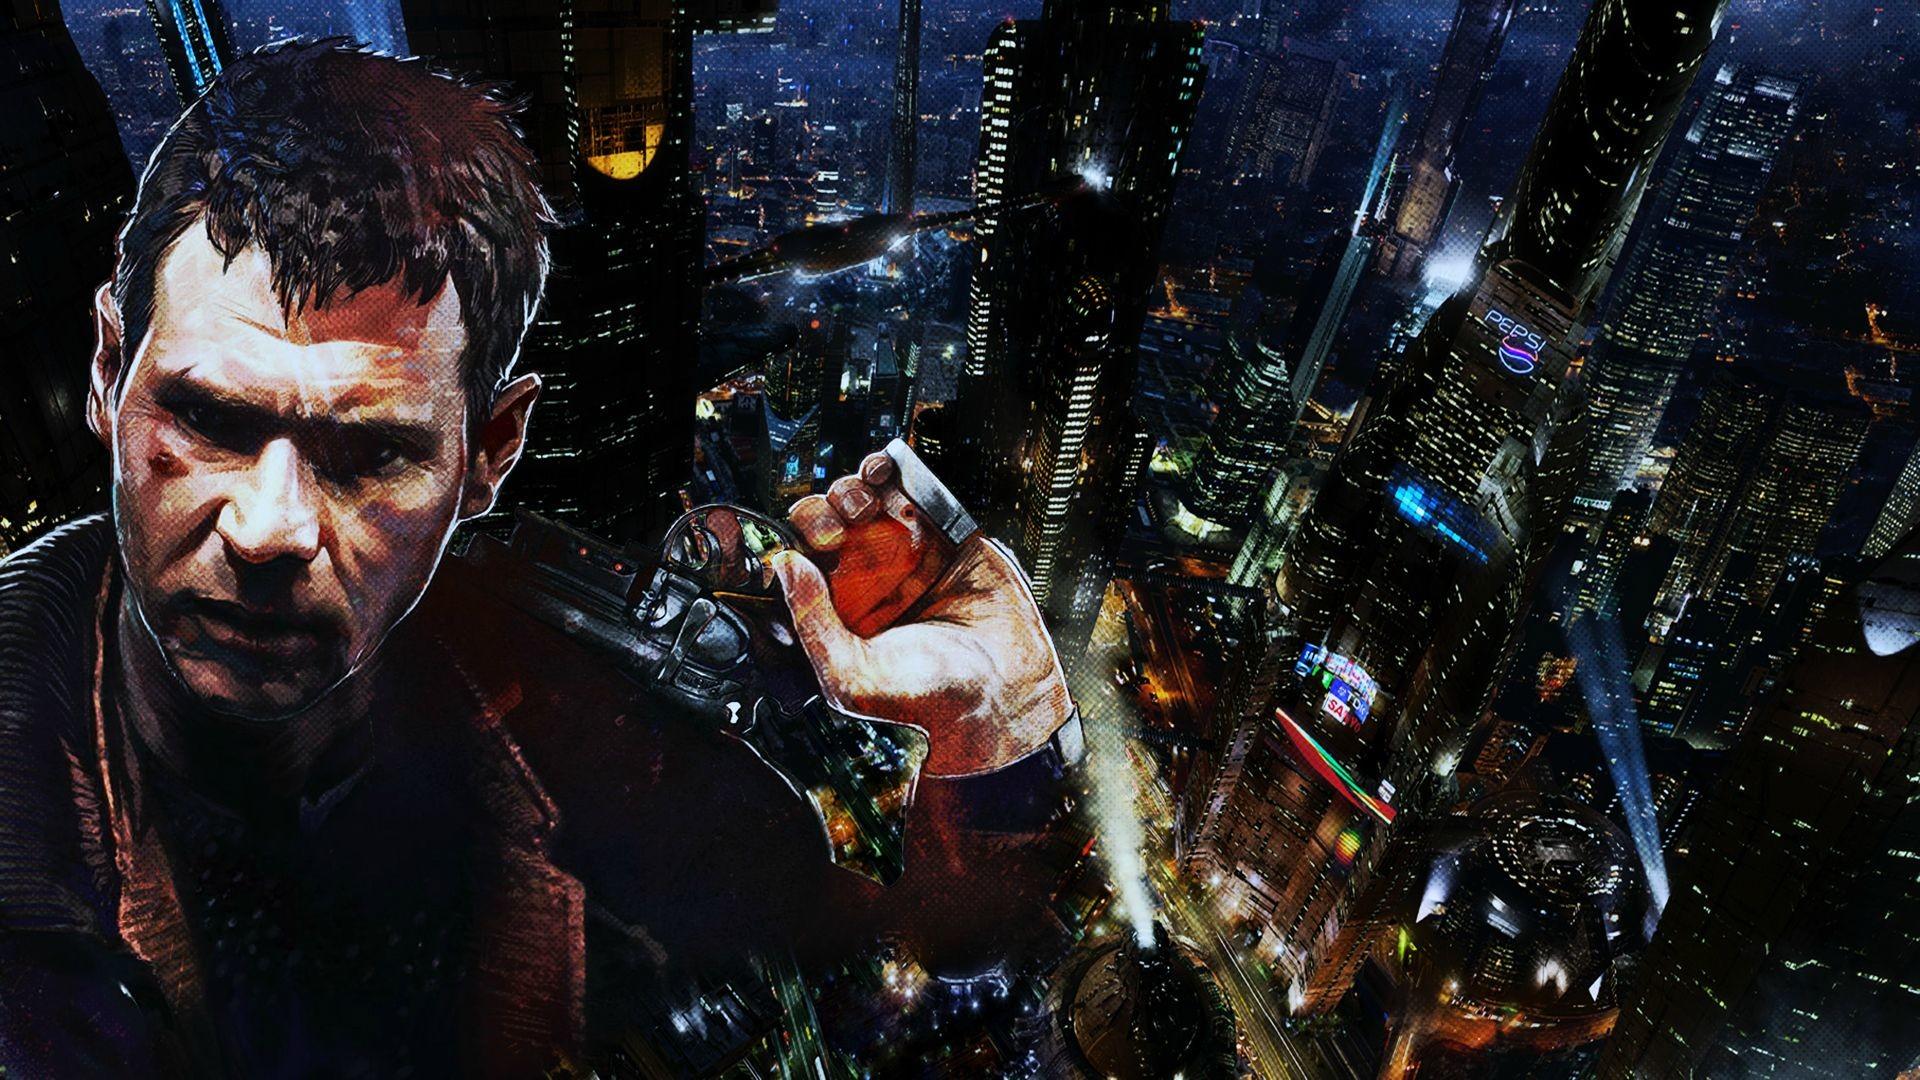 BLADE RUNNER drama sci-Fi thriller action city weapon gun dg wallpaper |  | 224091 | WallpaperUP